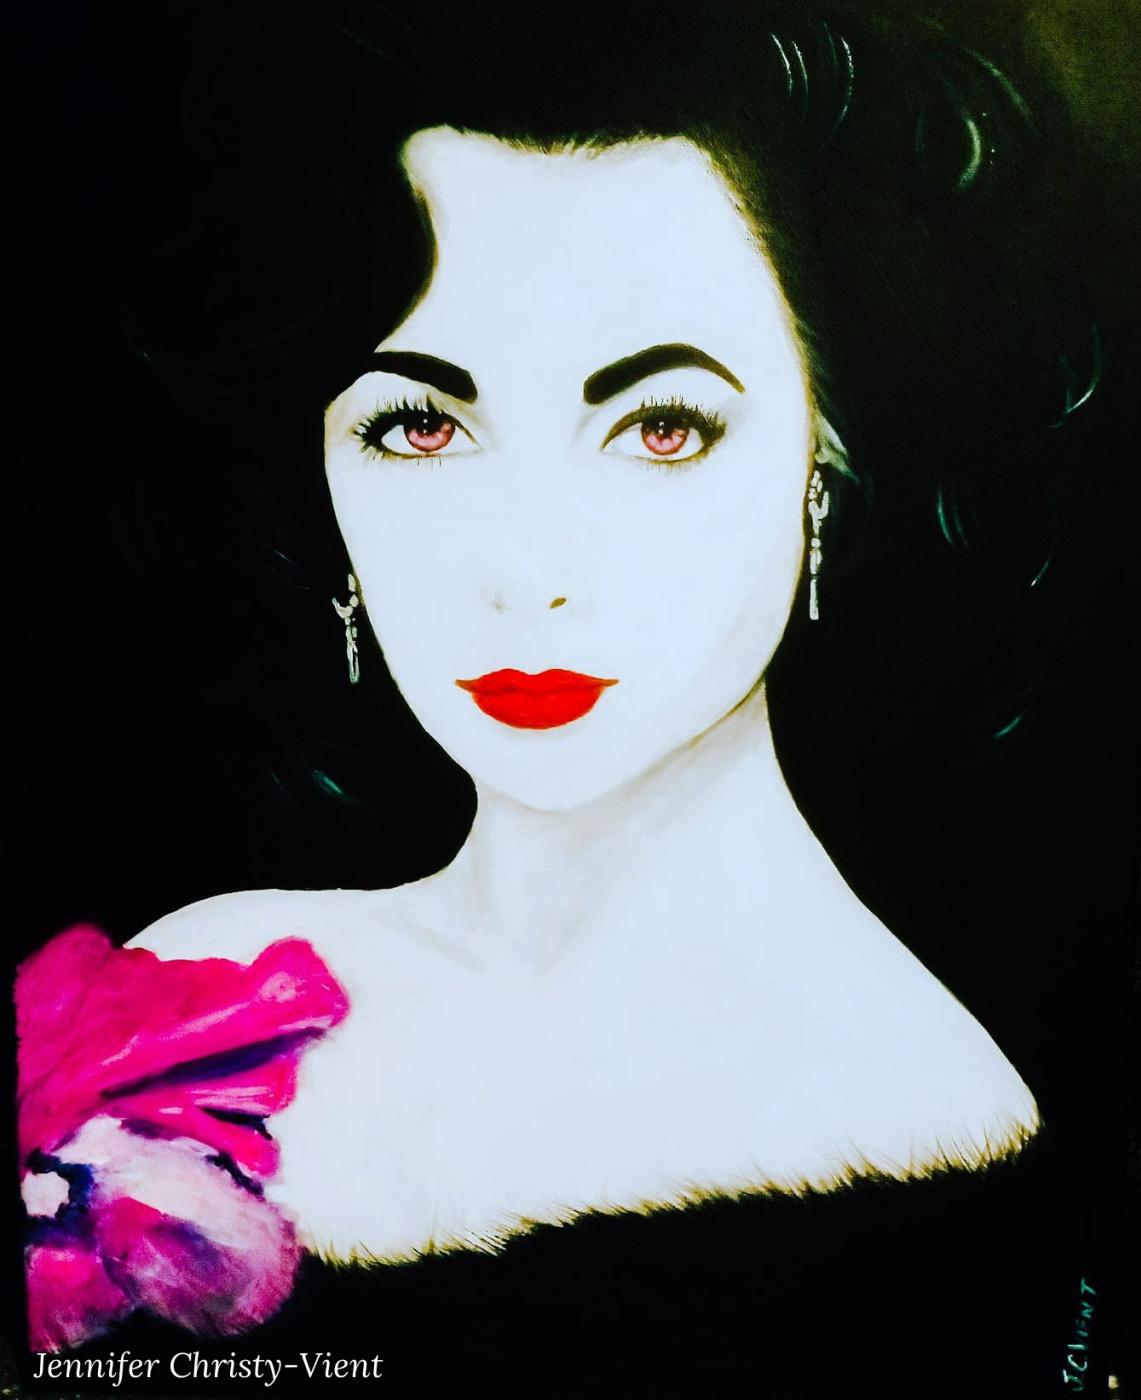 Jennifer Christy-Vient. Portrait of Elizabeth Taylor